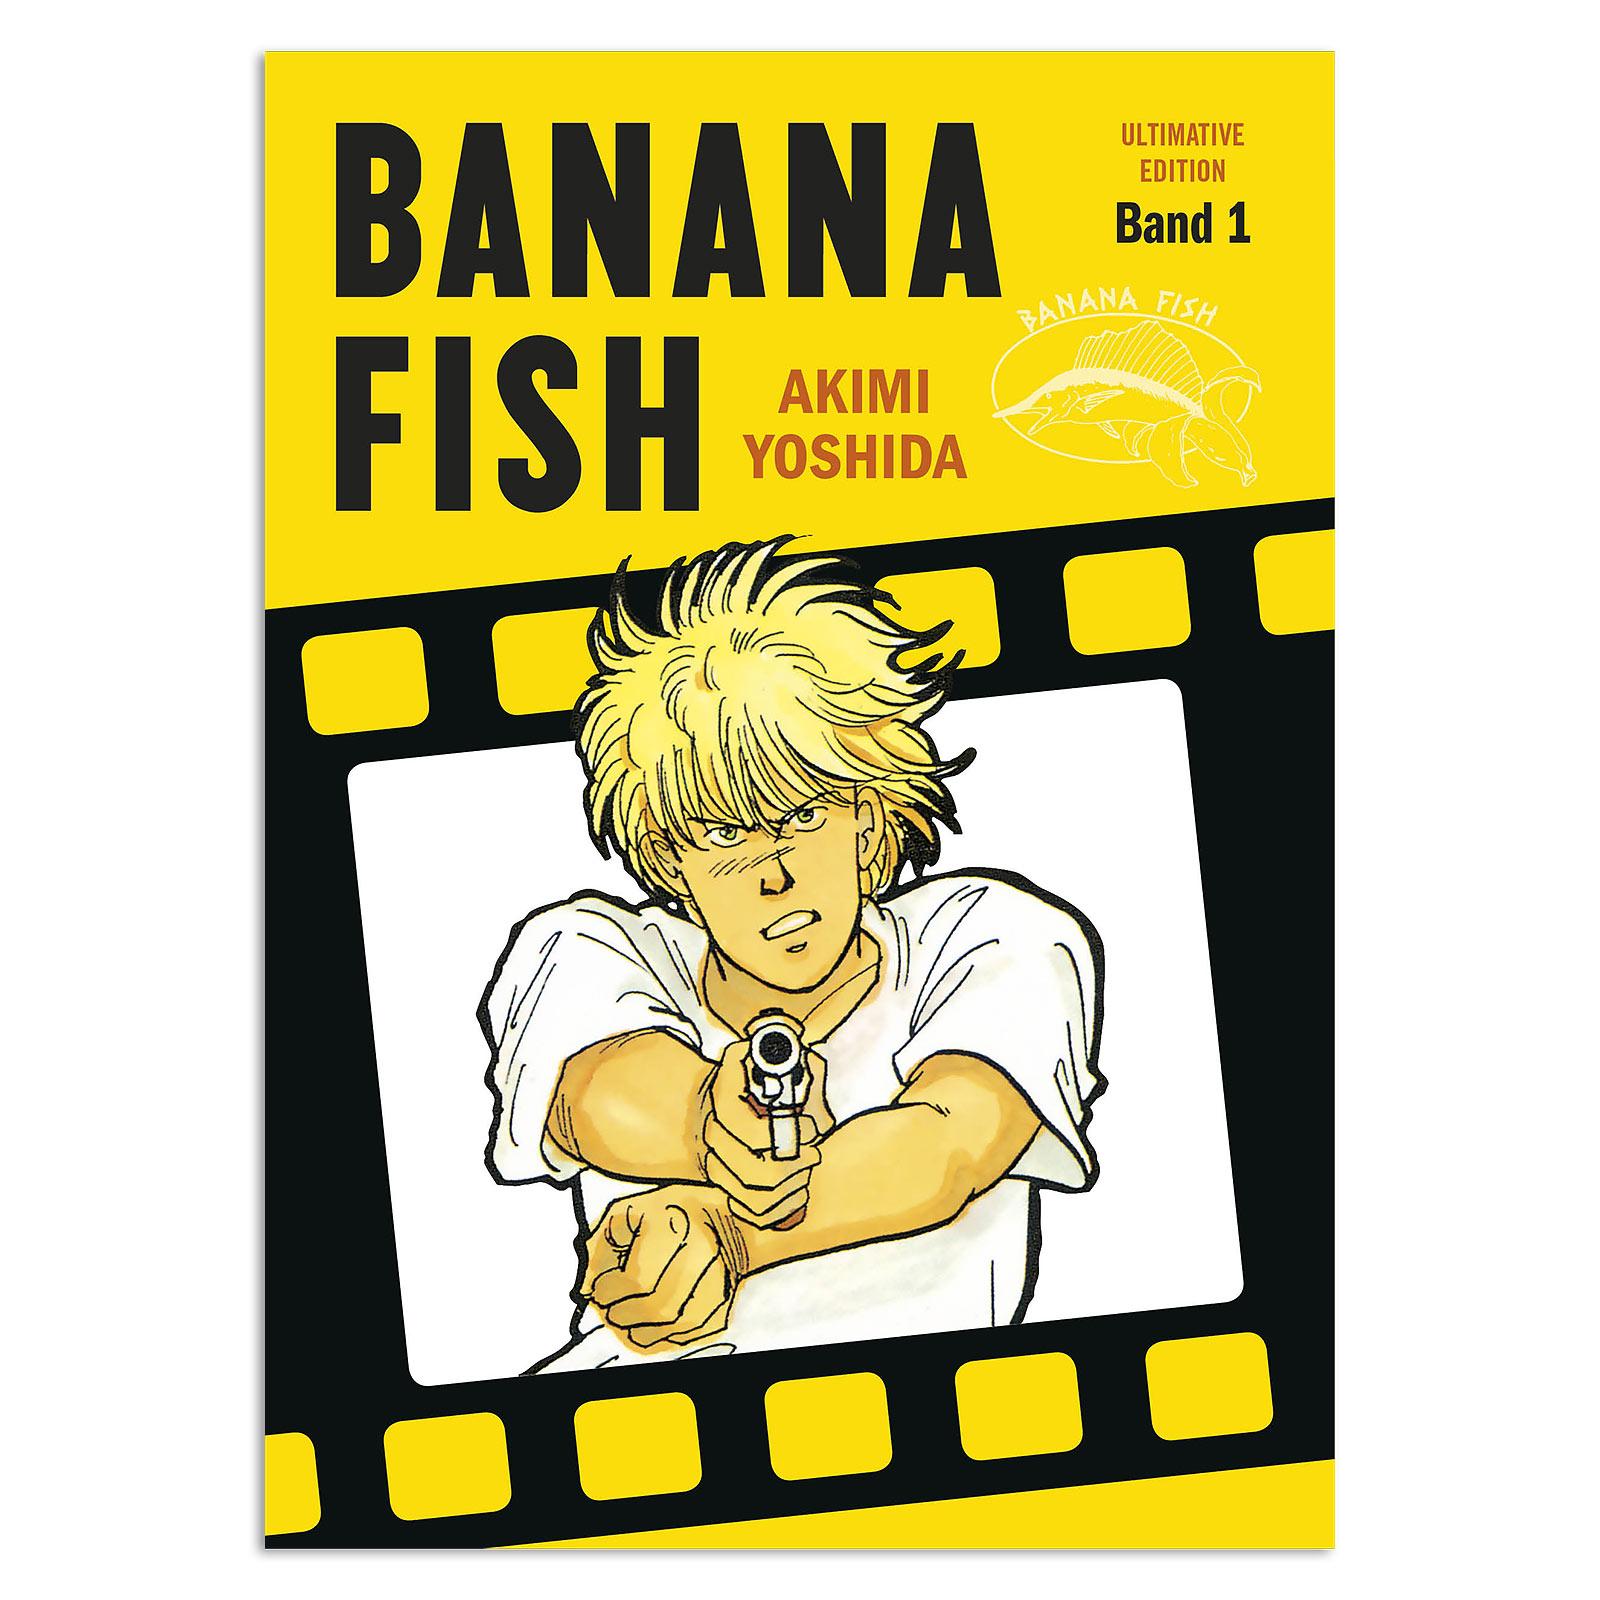 Banana Fish - Band 1 Taschenbuch Ultimate Edition